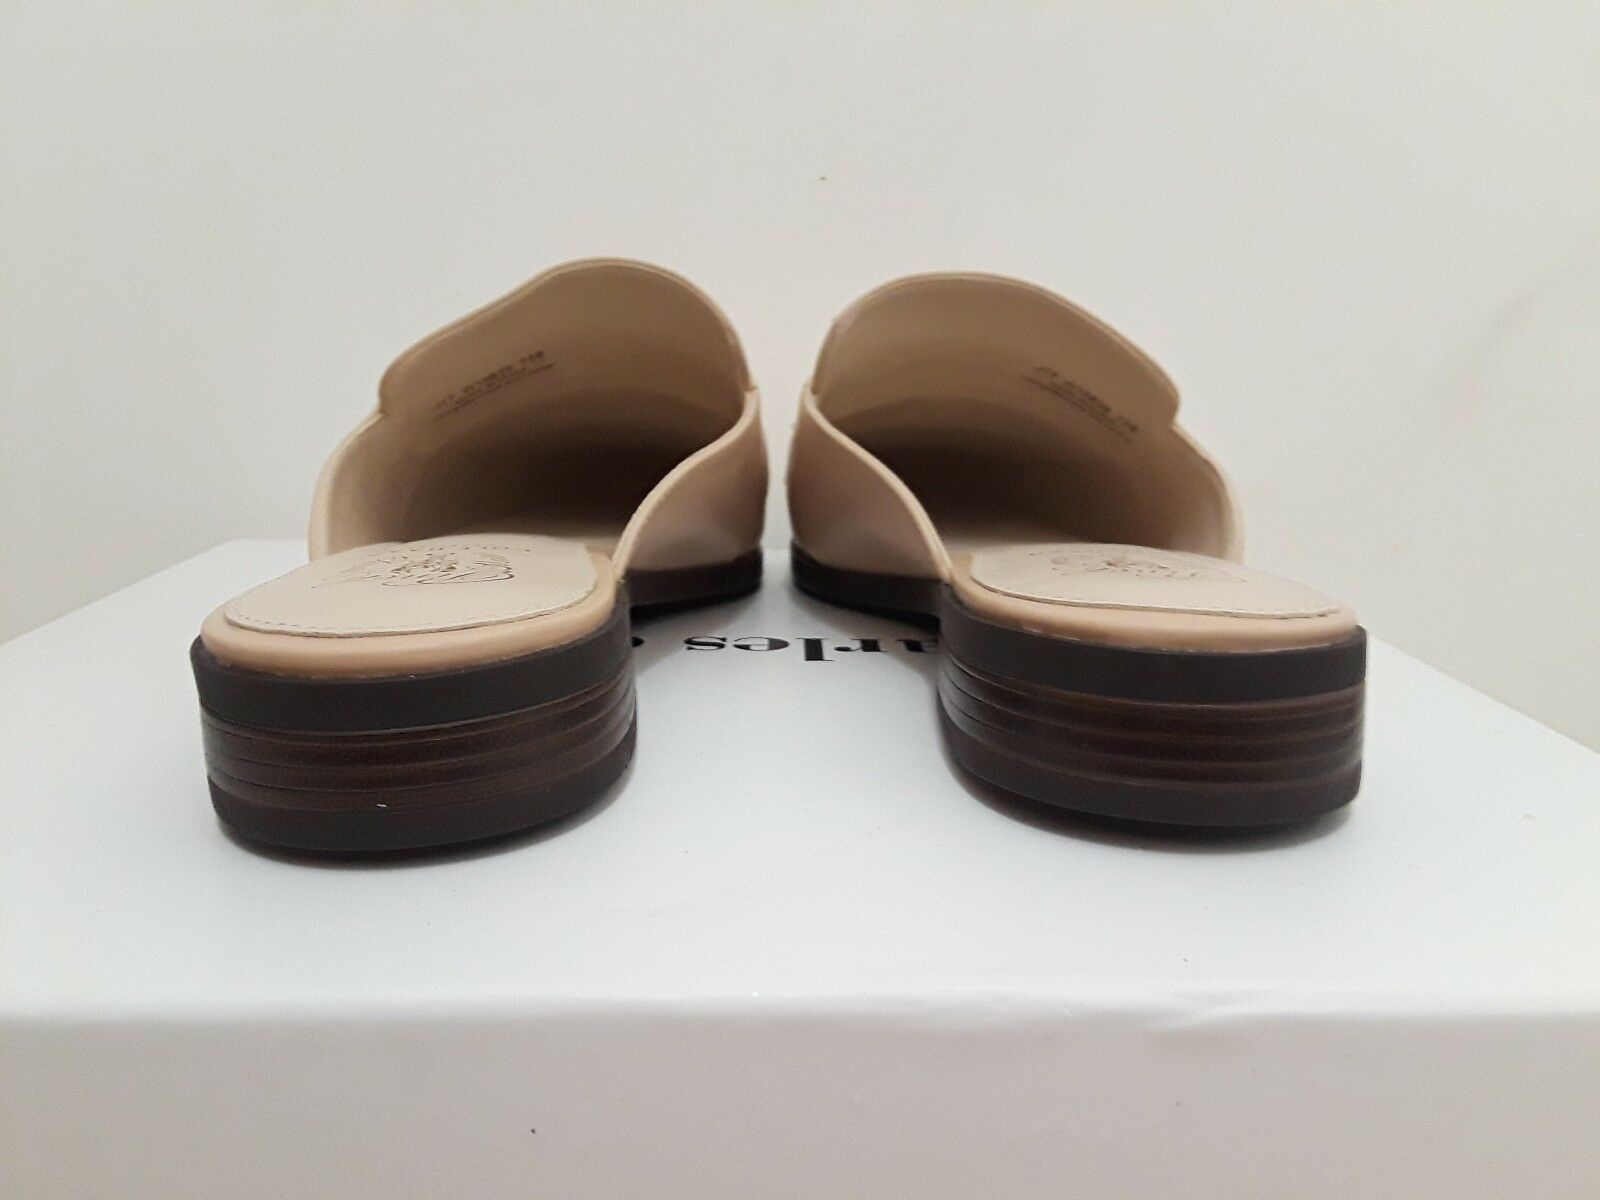 Cole Haan Haan Haan para mujer pellizco flecos diapositiva Mocasín-desnuda W10839 Tamaño  7.5 e89164